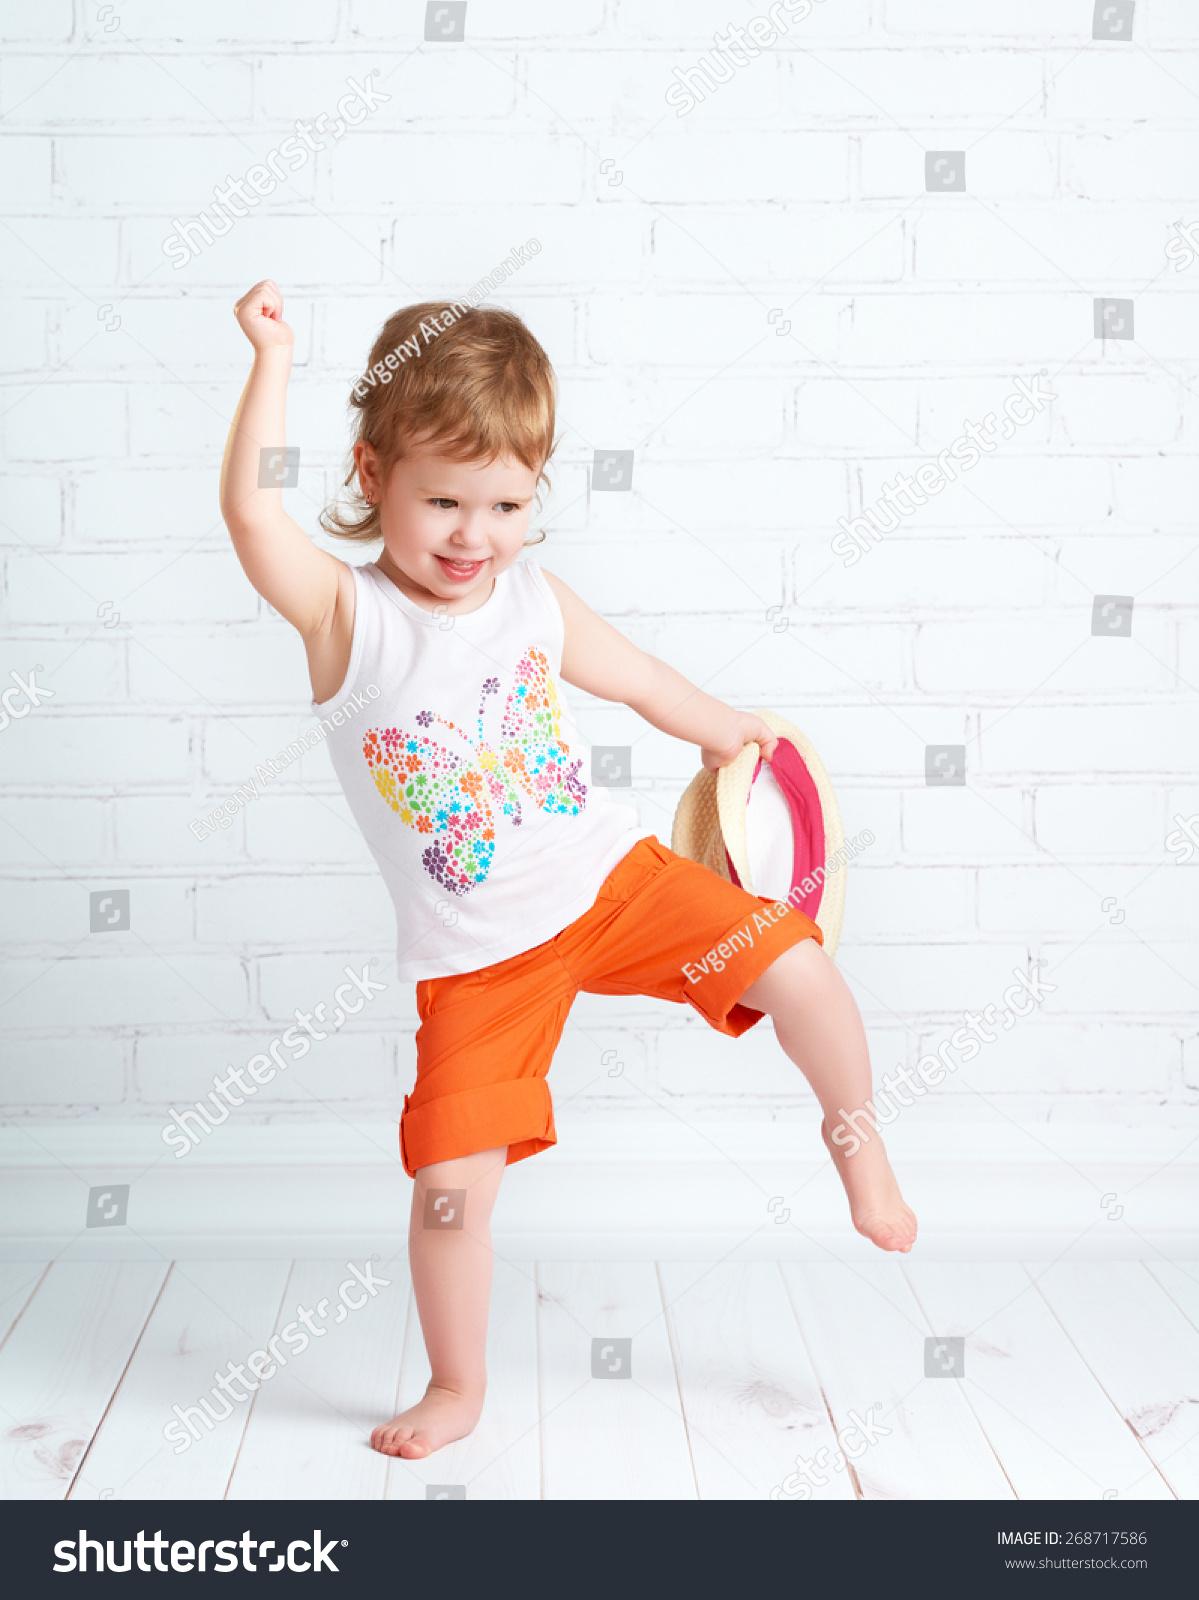 Jan 06, · Funny boy dancing, urdu funny videos, punjabi totay, pakistani funny videos, home girls dance, local girls dance, indian funny videos, punjabi mujra - Video Dailymotion sturgis motorcycle rally black hills biker chicks pole dancing girls girls girls.